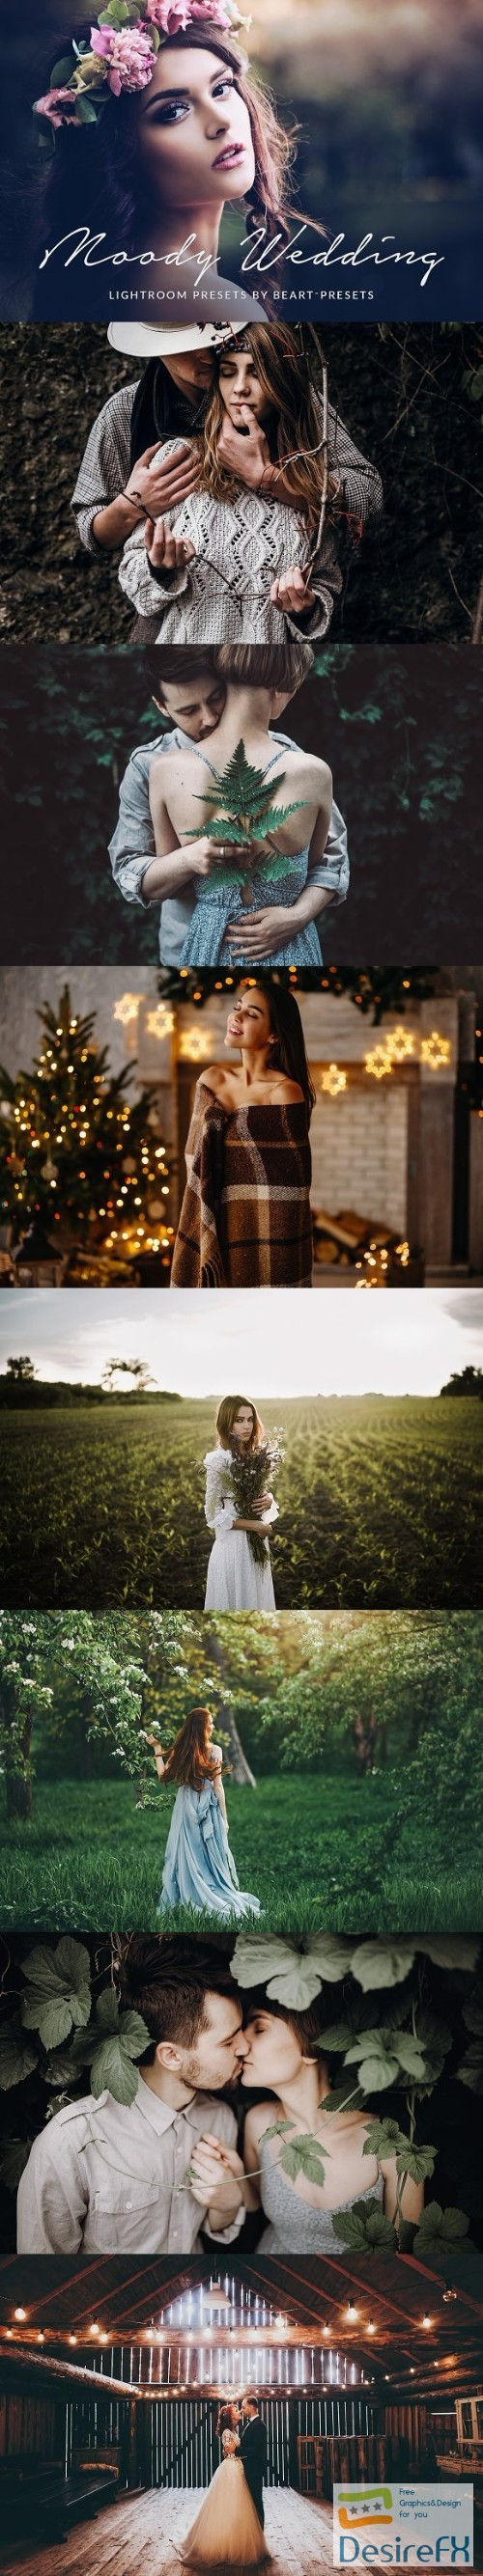 actions-atn - Moody Wedding Lightroom Presets 2290226